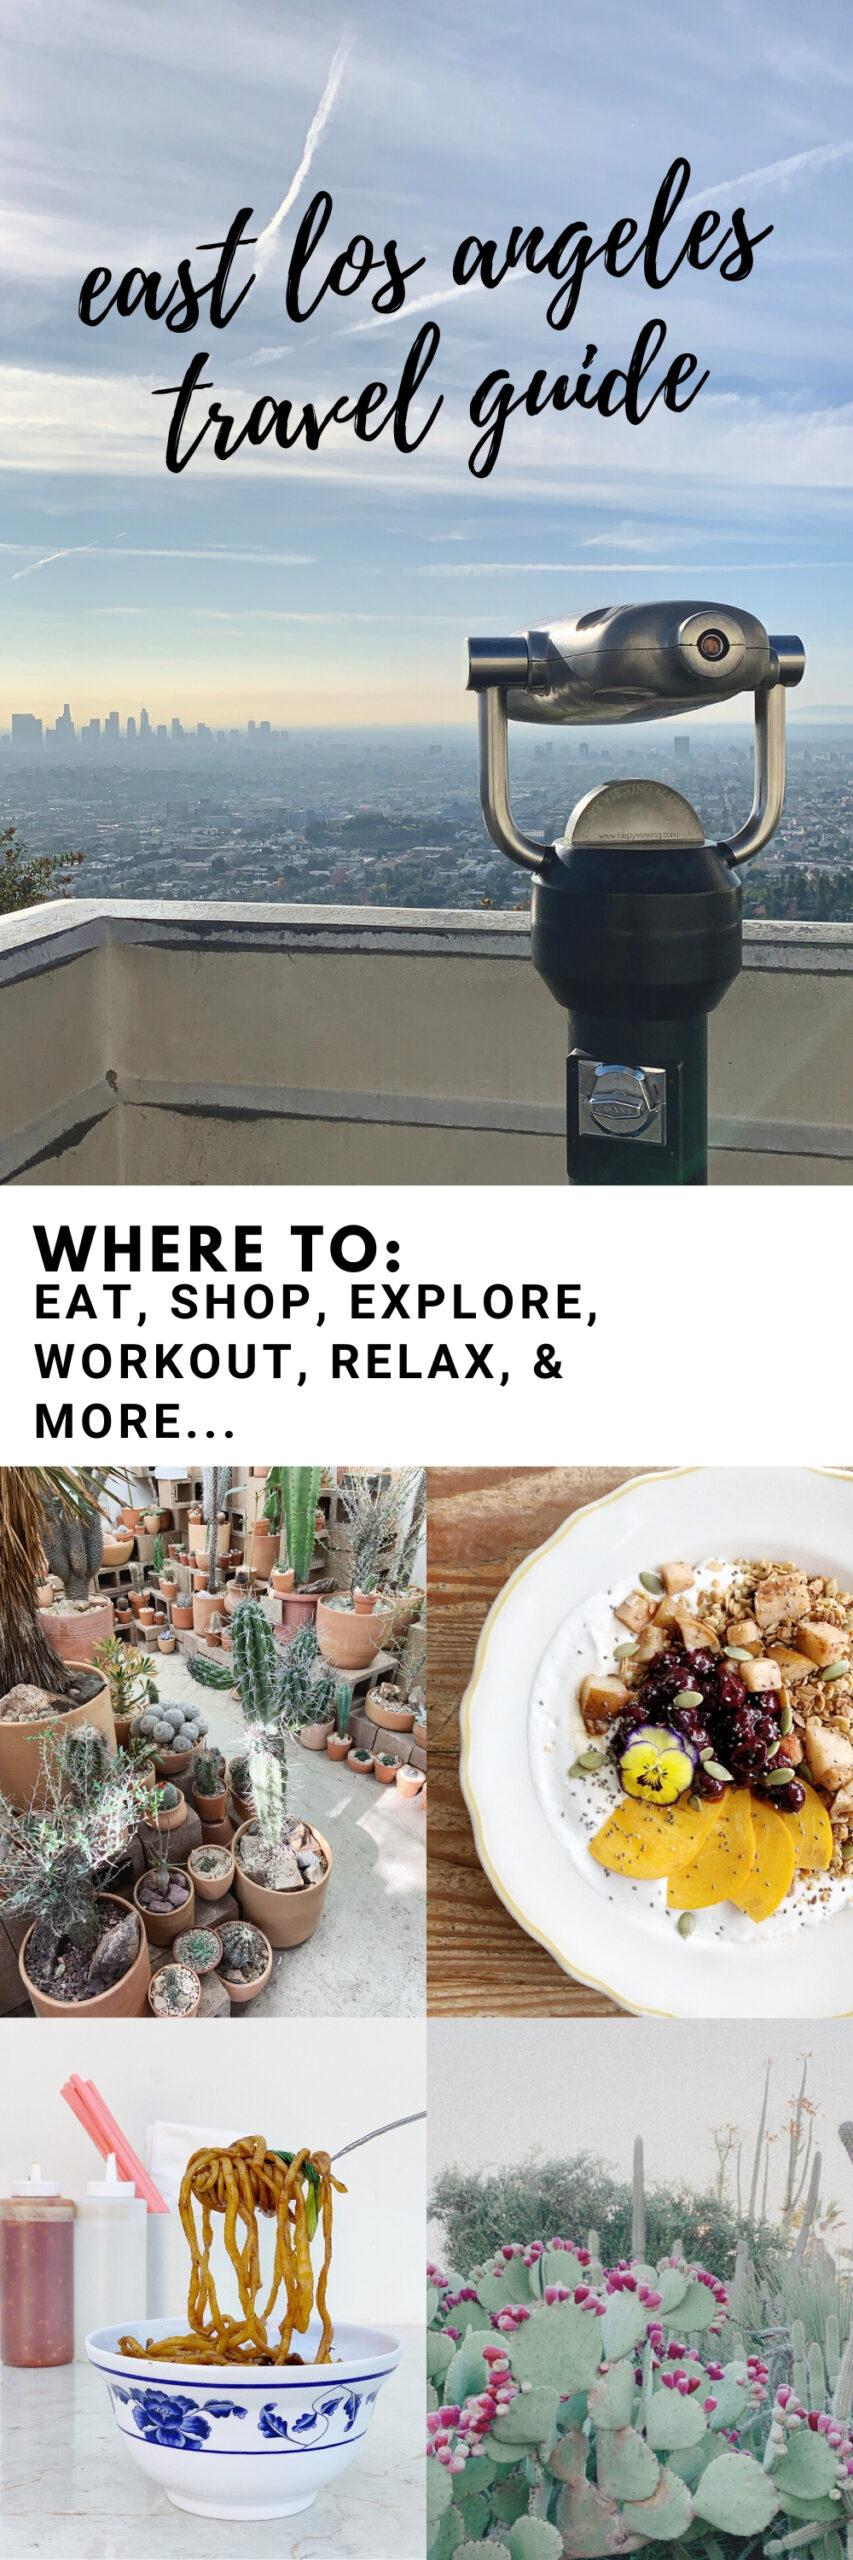 east LA travel guide